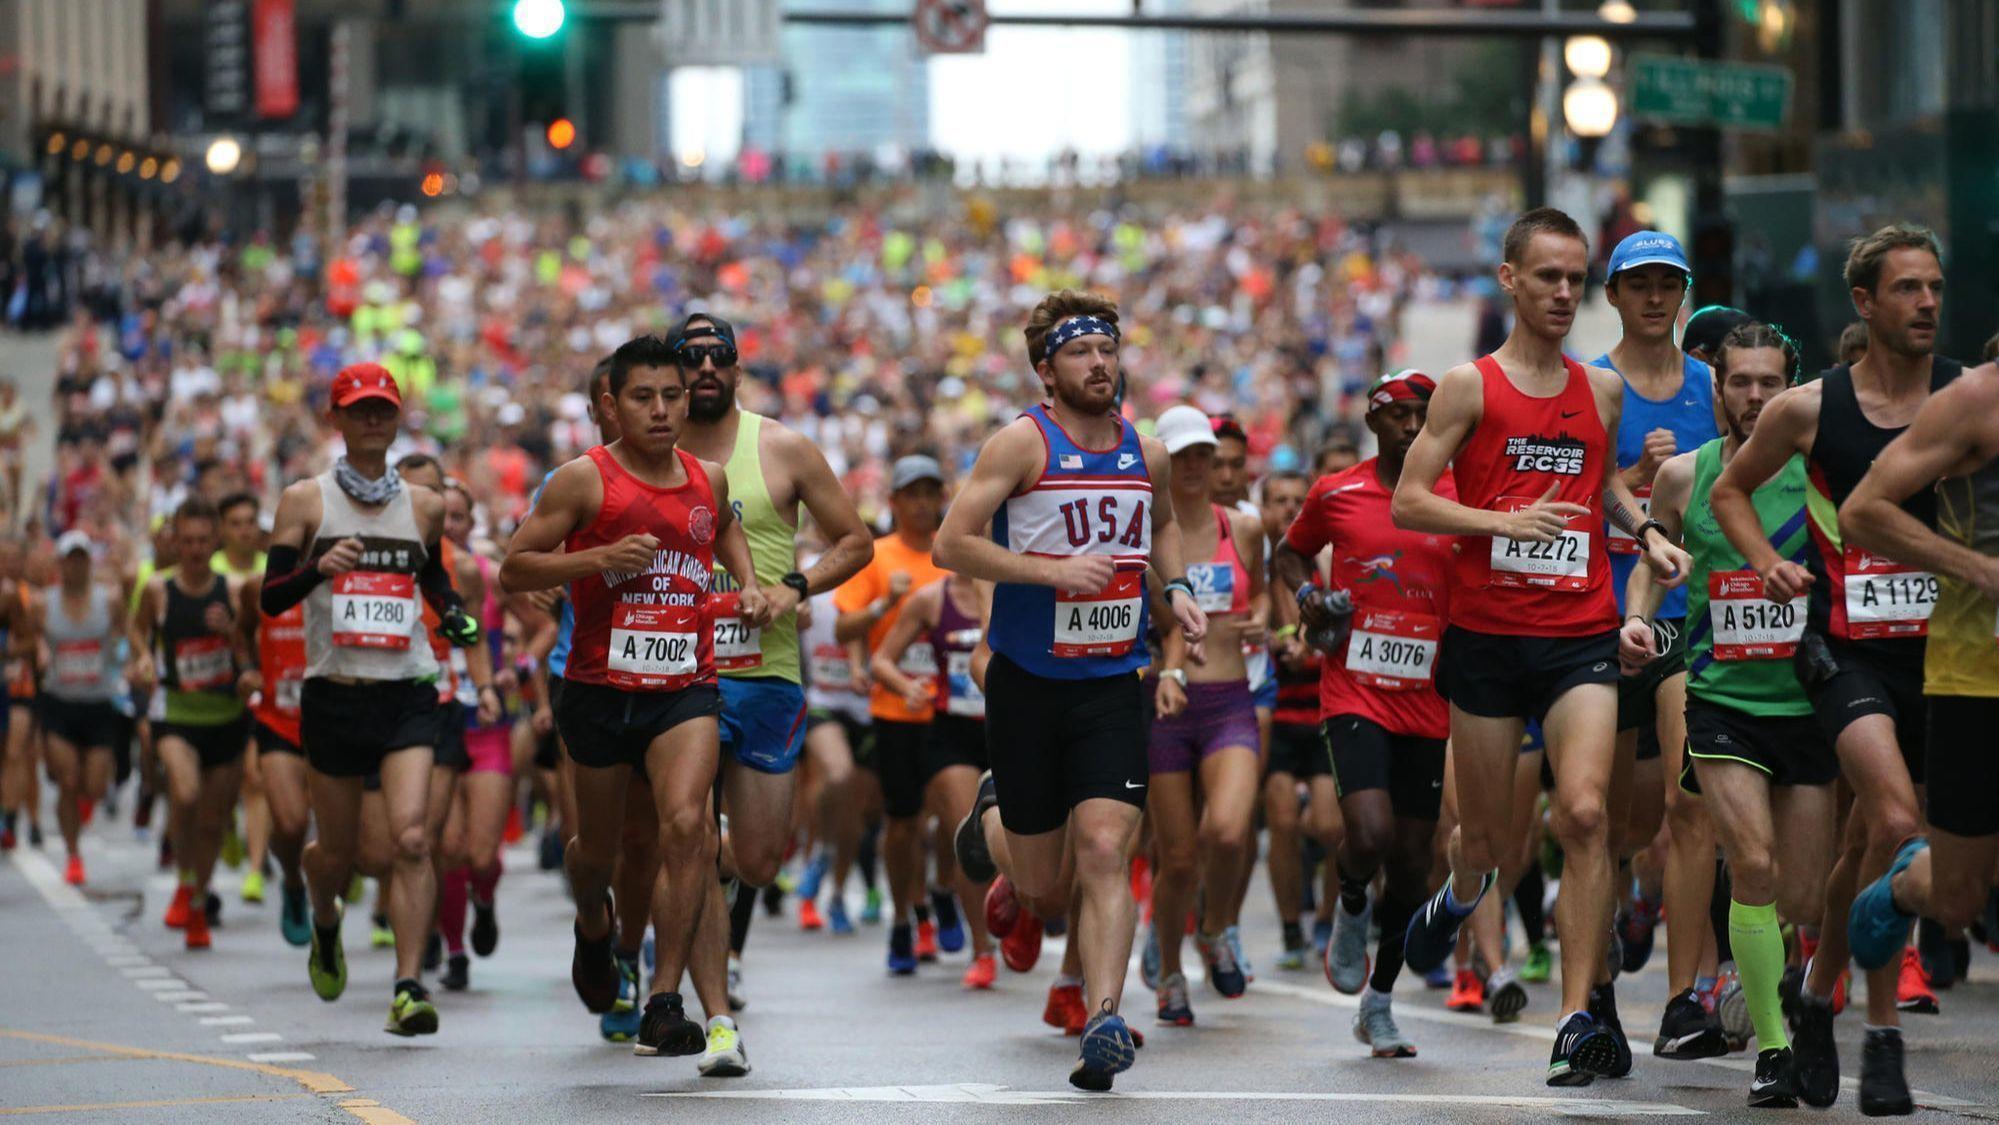 Chicago marathon 2019 date in Perth